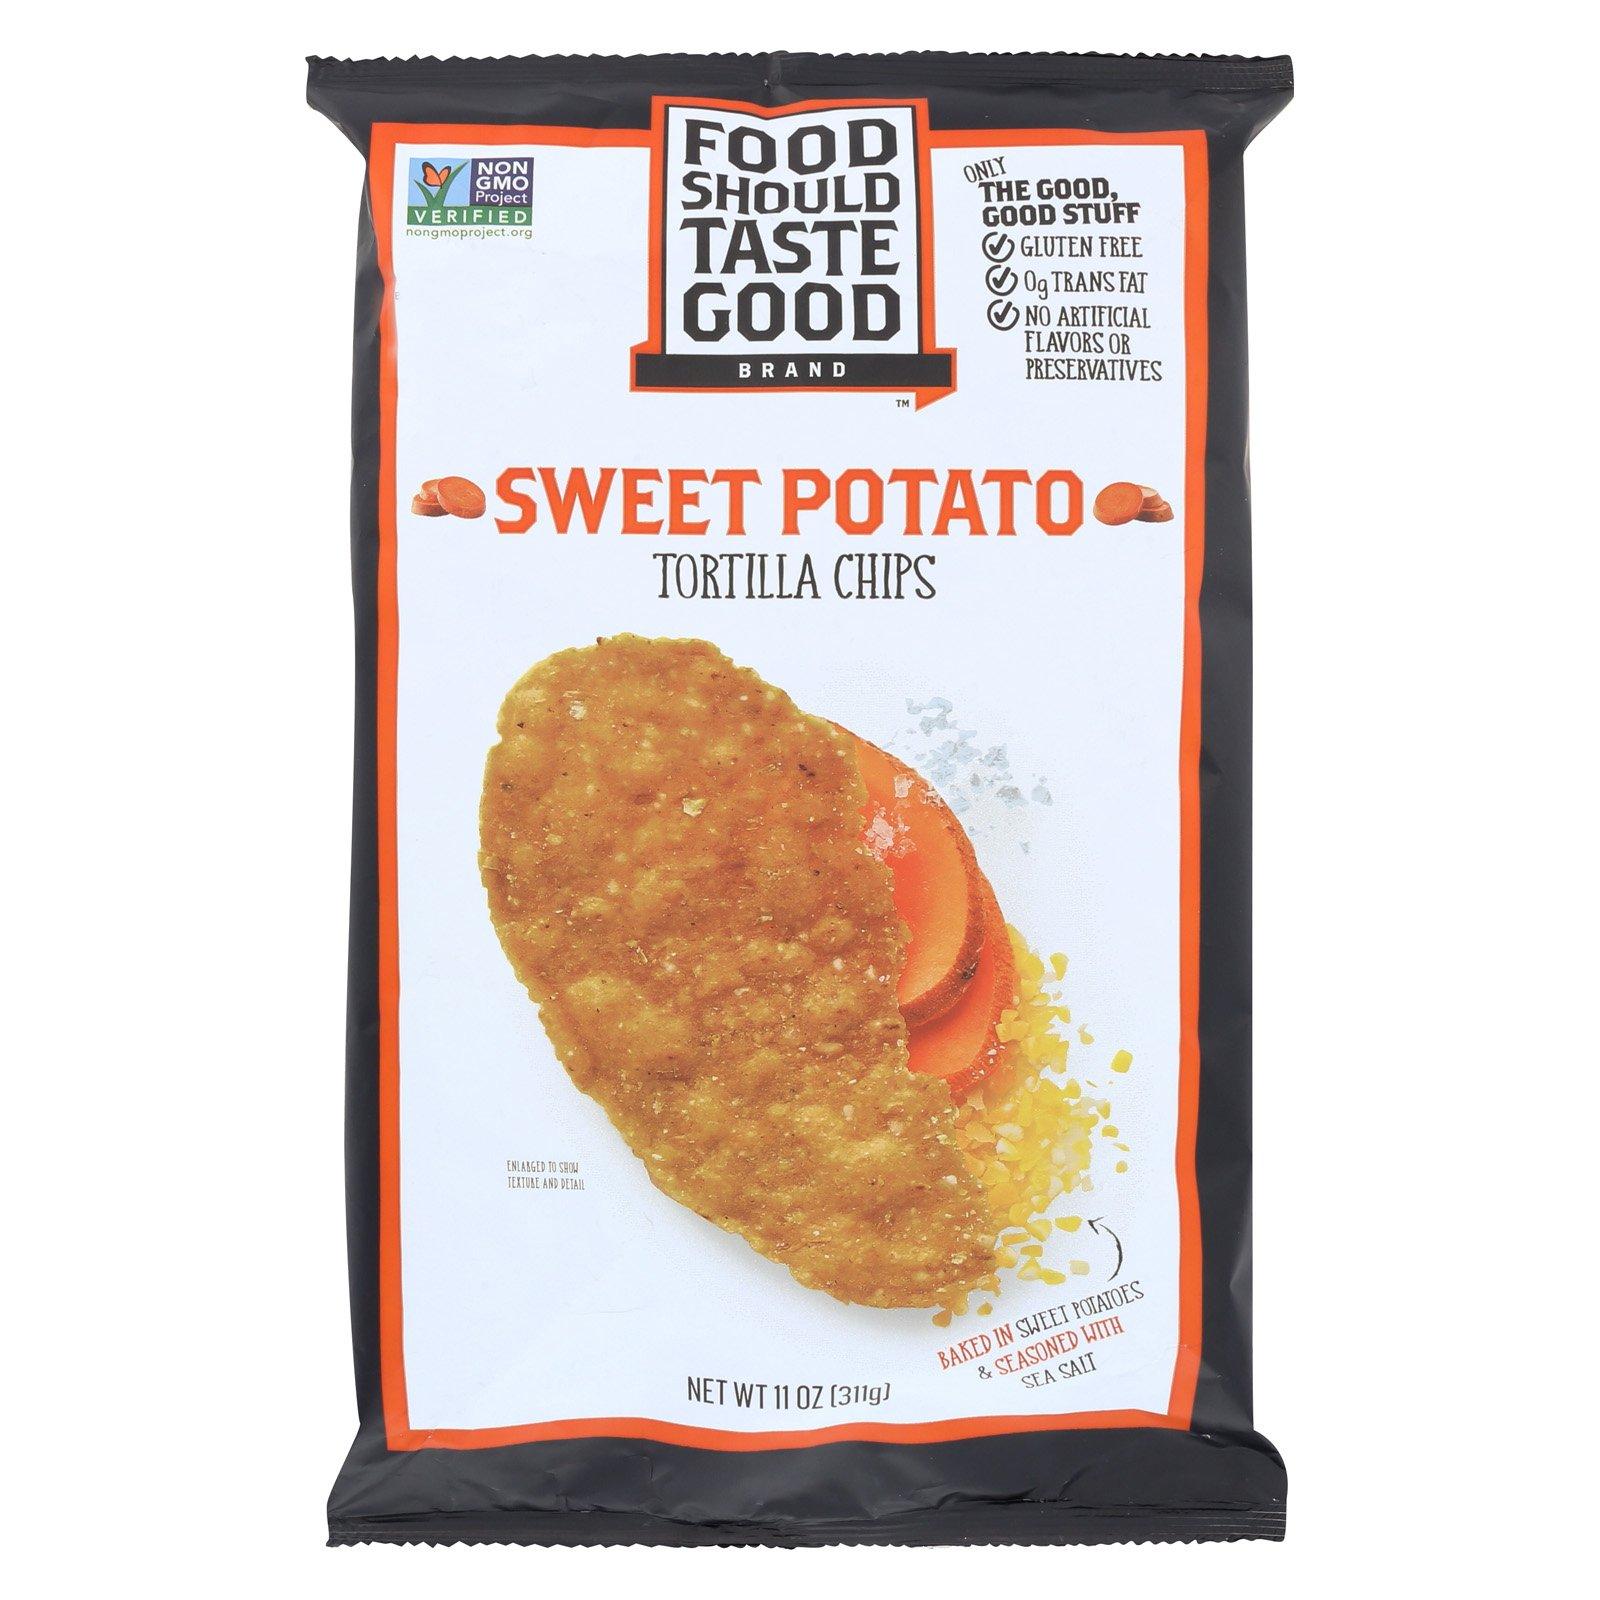 Food Should Taste Good Sweet Potato Tortilla Chips - Sweet Potato - Case of 12 - 11 oz. by Food Should Taste Good